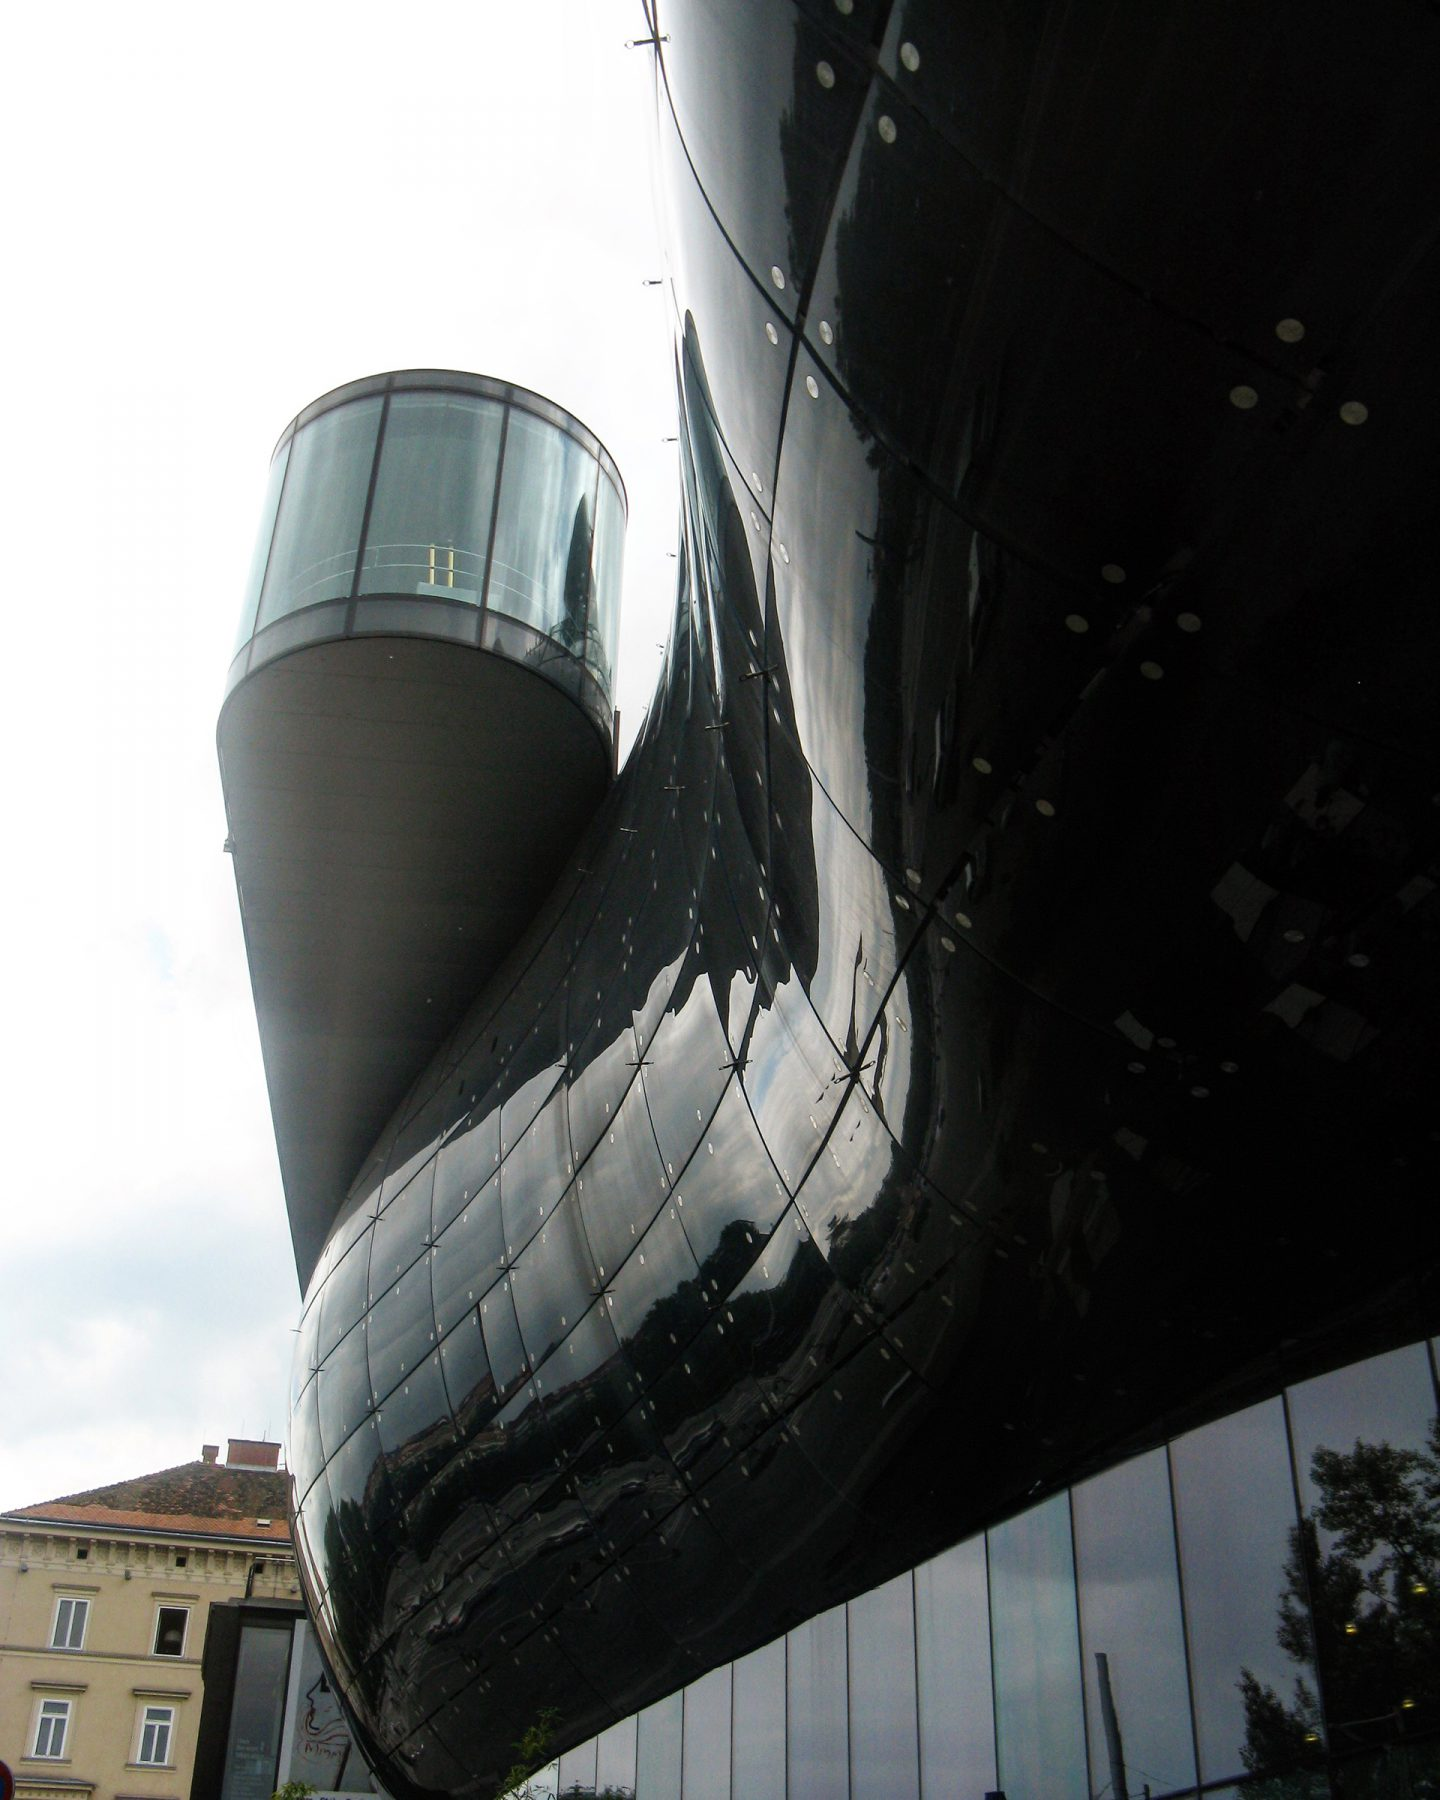 Arkitektur konstmuseum eller vanlig utomjording